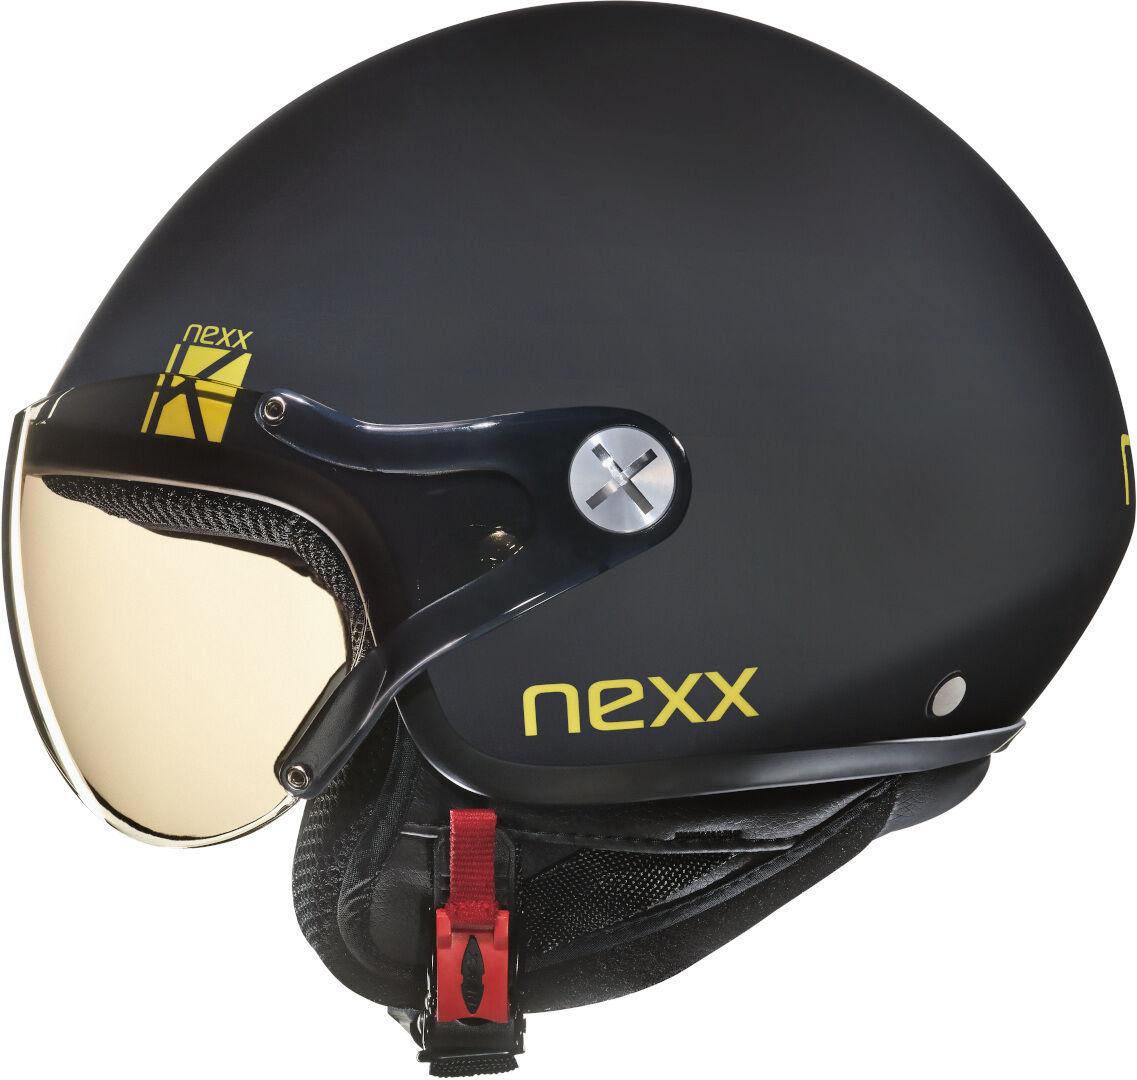 Nexx Urban SX.60 Kids K Kids Jet Helmet Casque de jet d'enfants Noir taille : 3XS 2XS